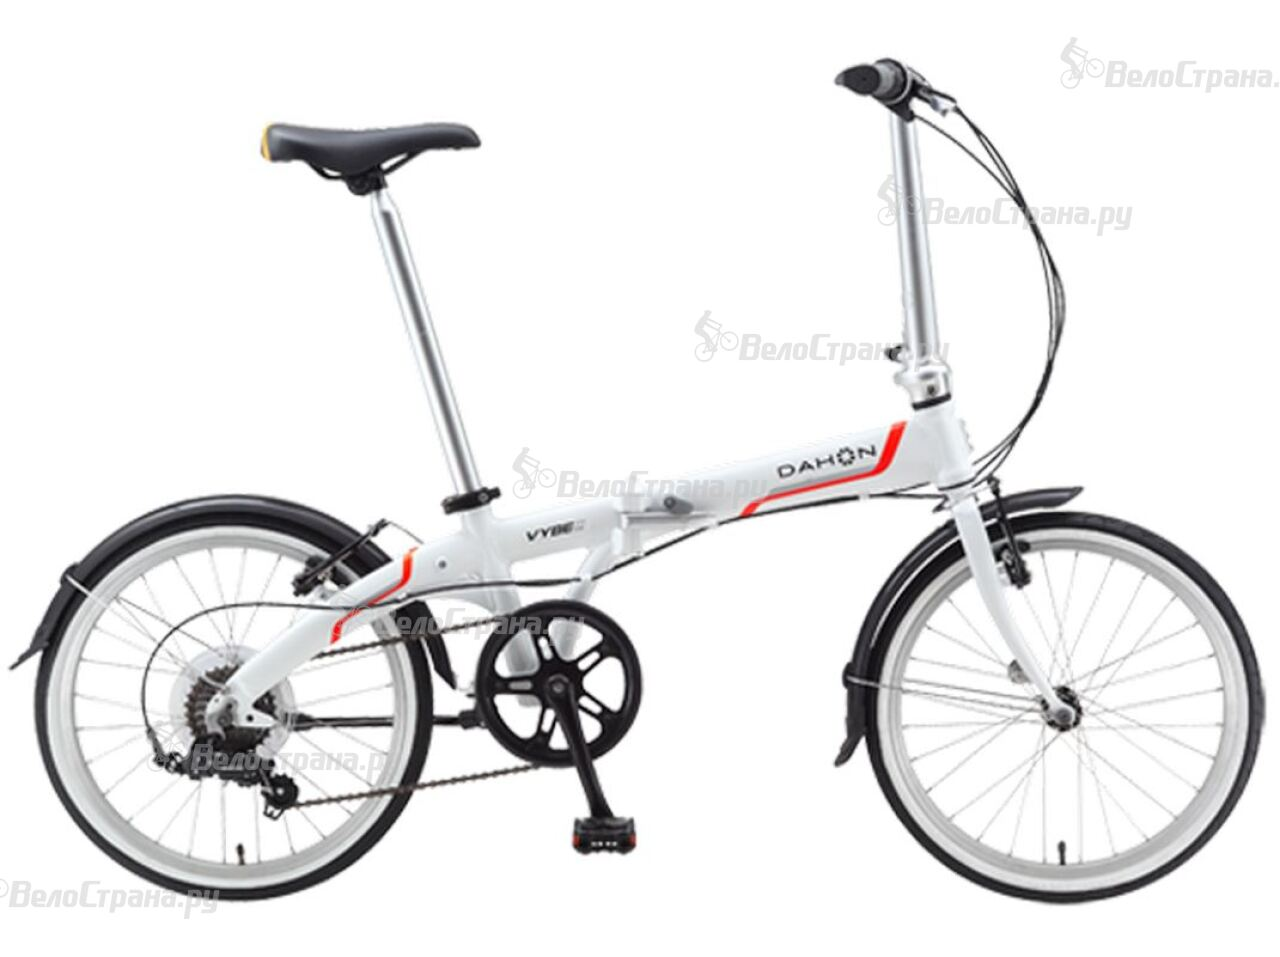 Велосипед Dahon Vybe D7 (2015) гарнитура yison d7 pink